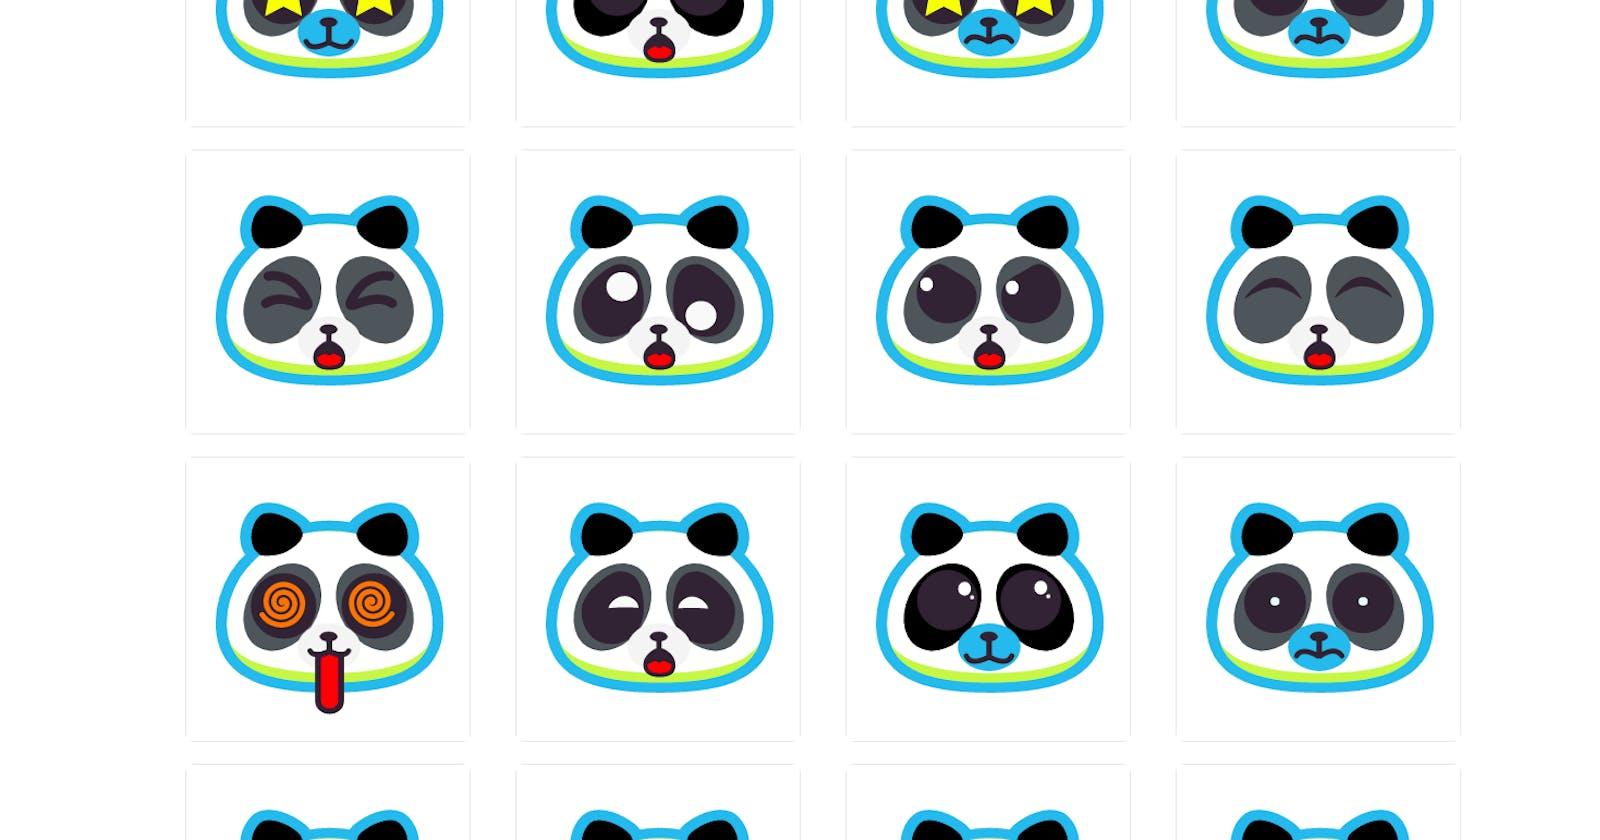 Introducing Avatarsum: Cute Pandas for your app